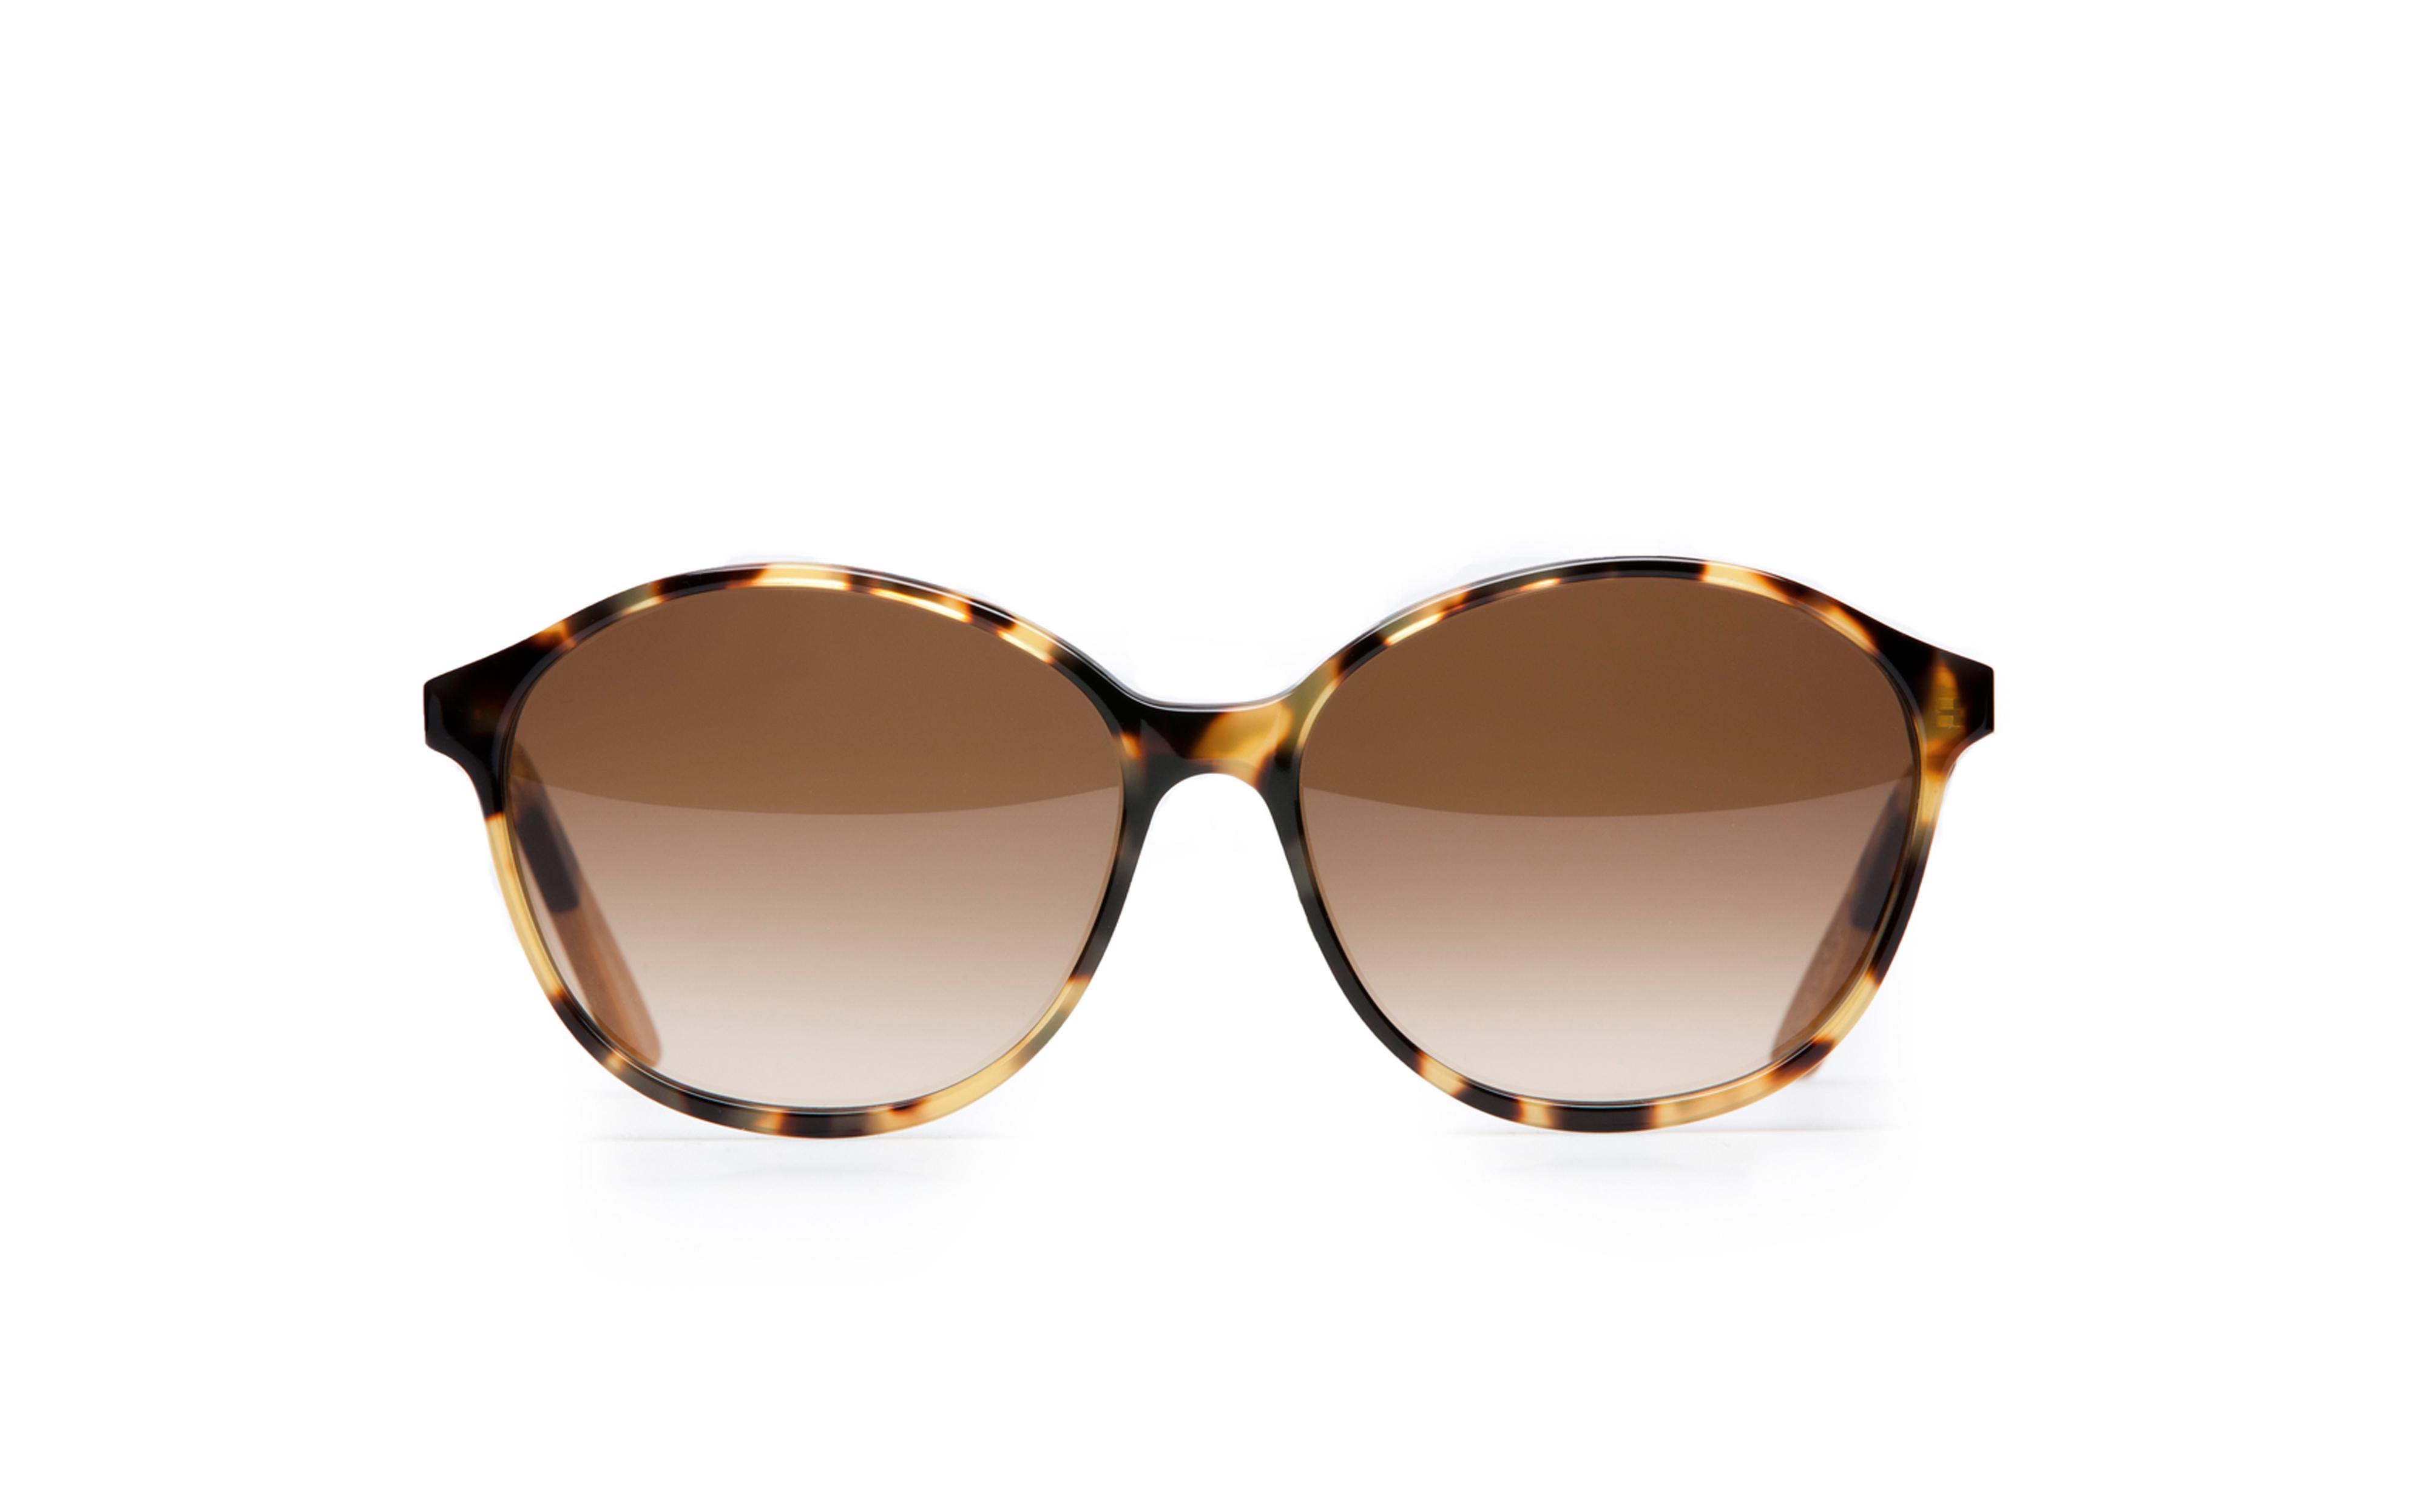 Club Sunglasses - Beach